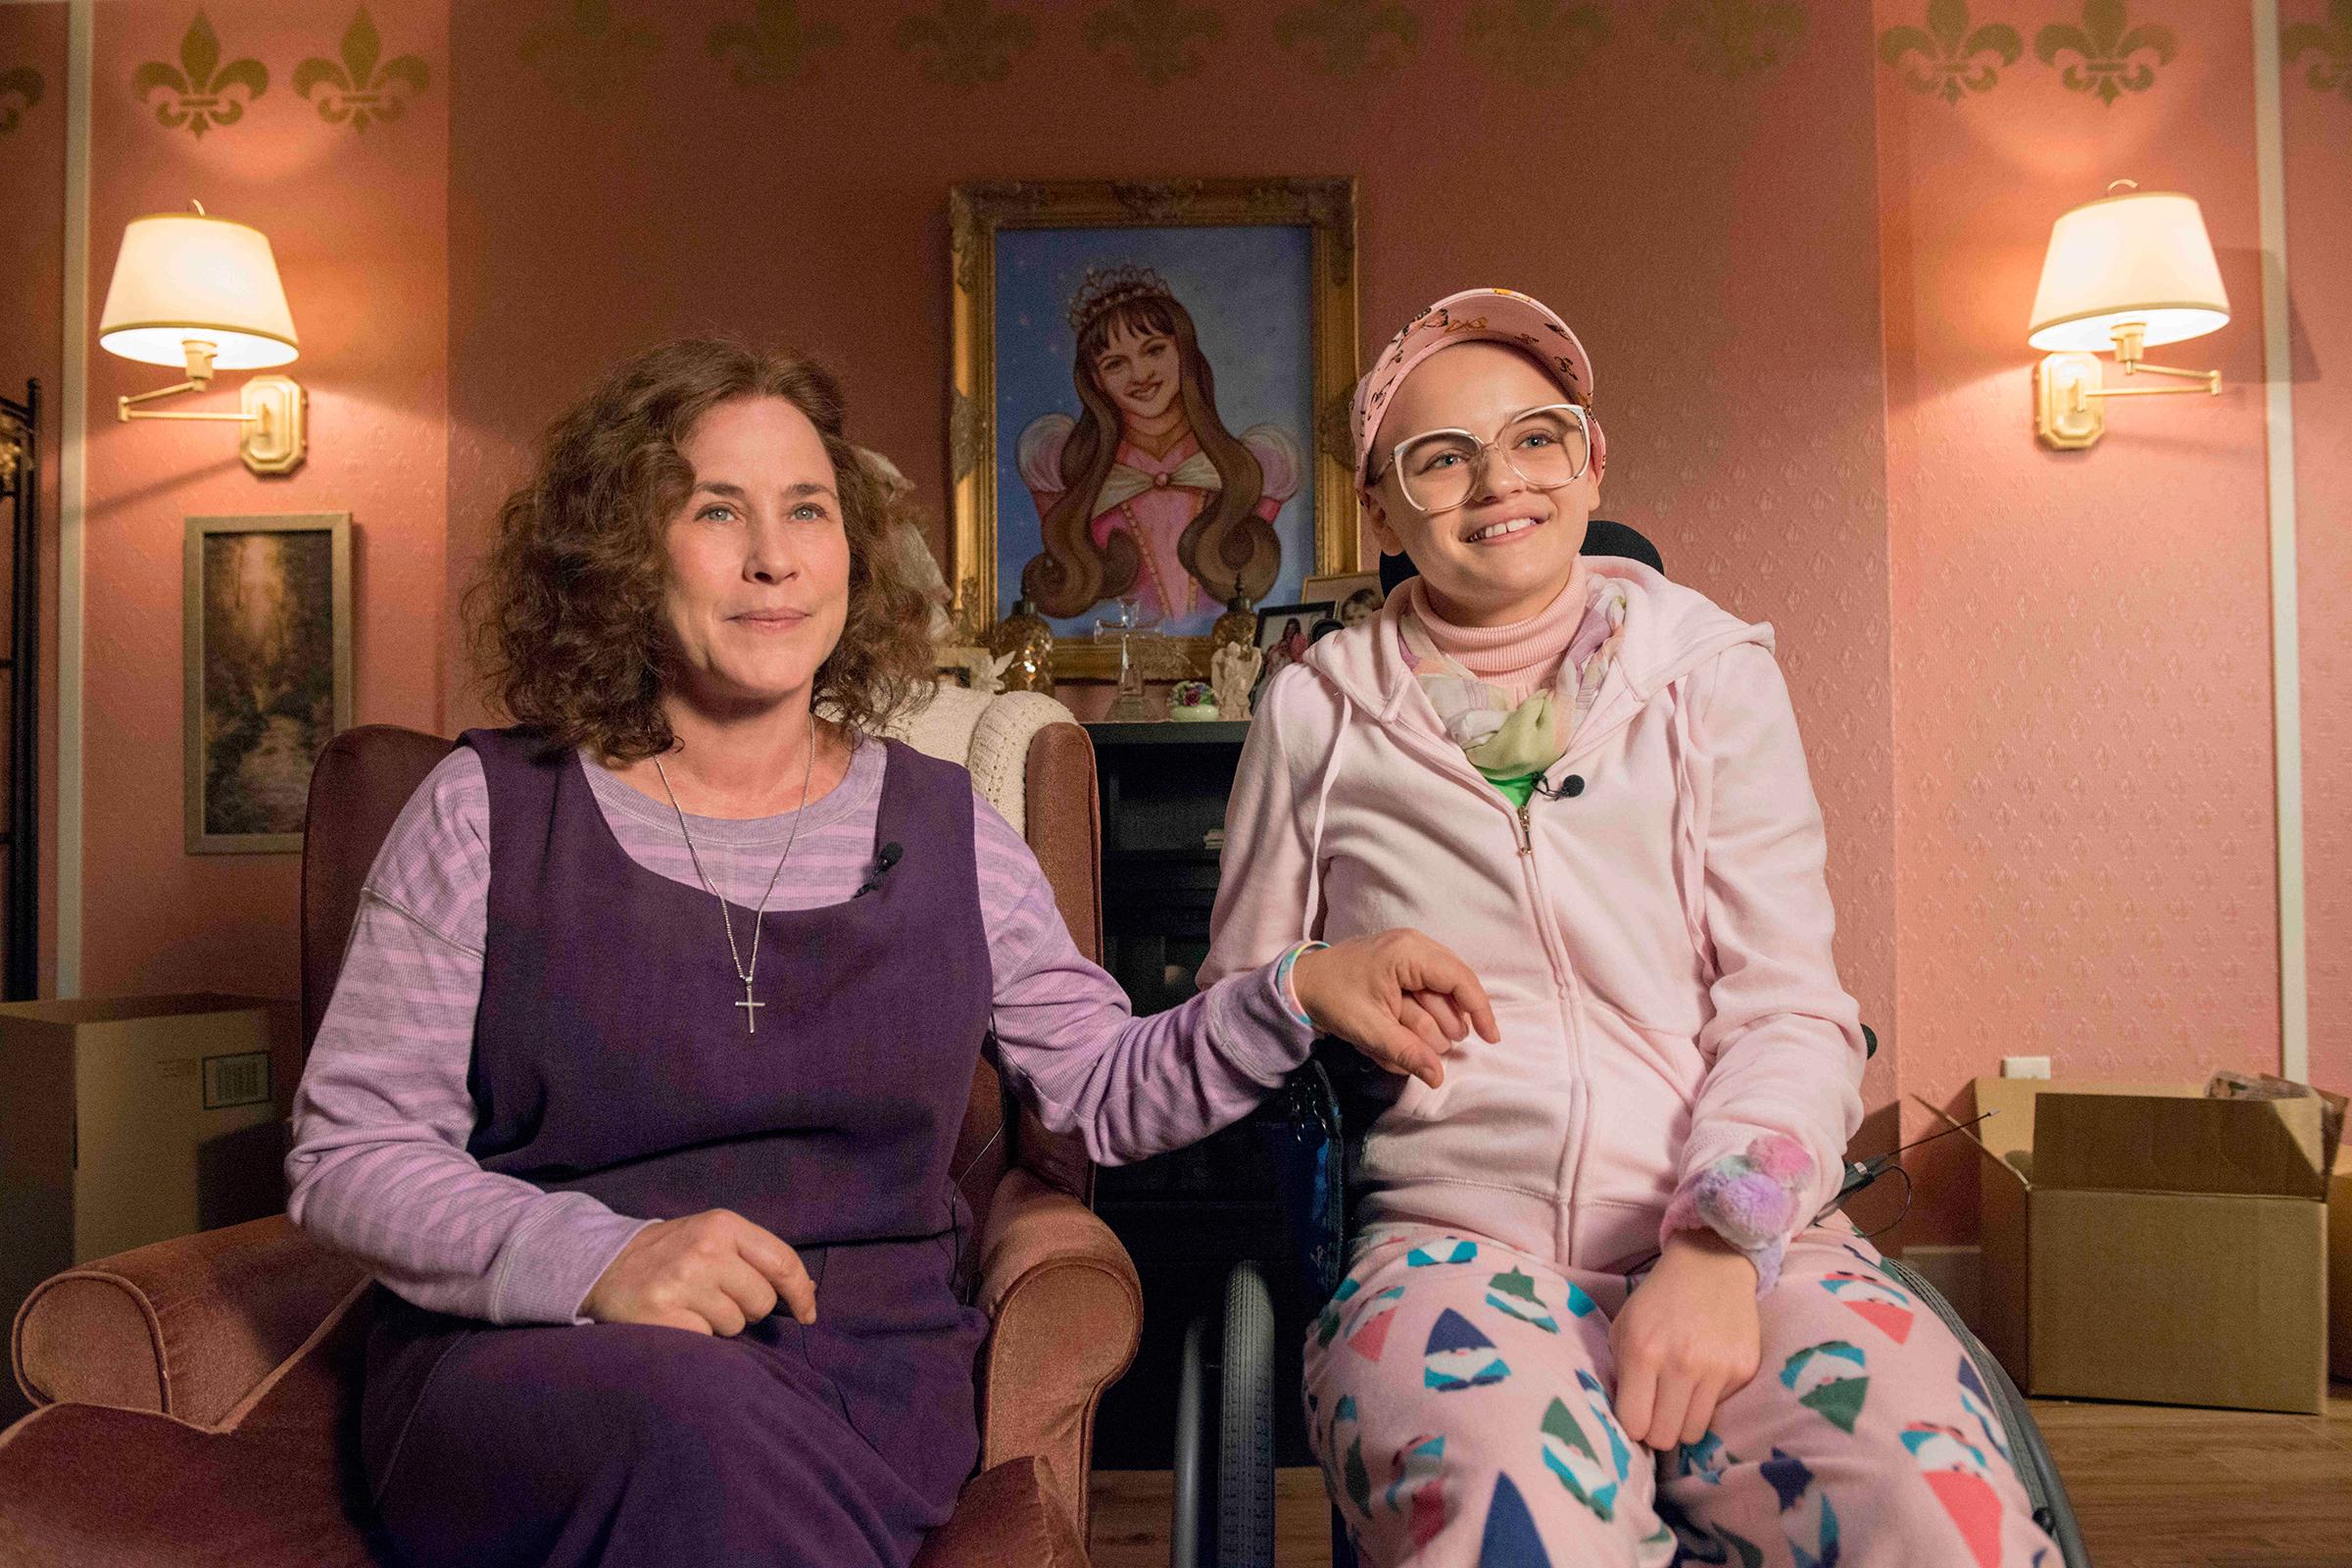 Dee Dee and Gypsy Rose Blanchard Subject of New Hulu Show